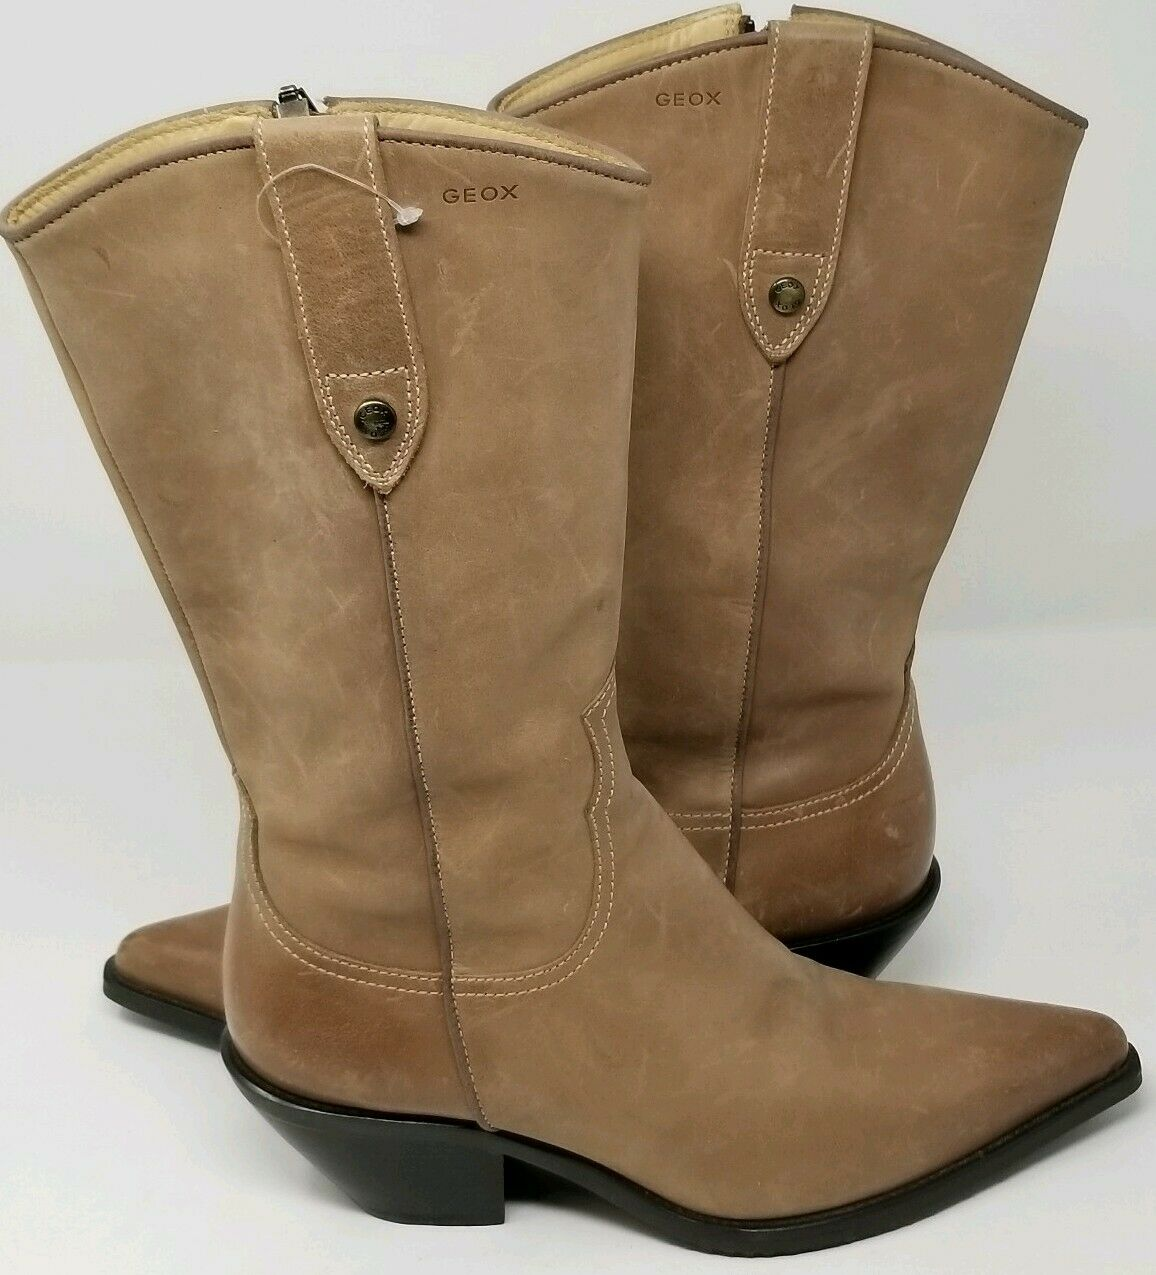 Geox Respira Womens Western Style Boots - Tan 37